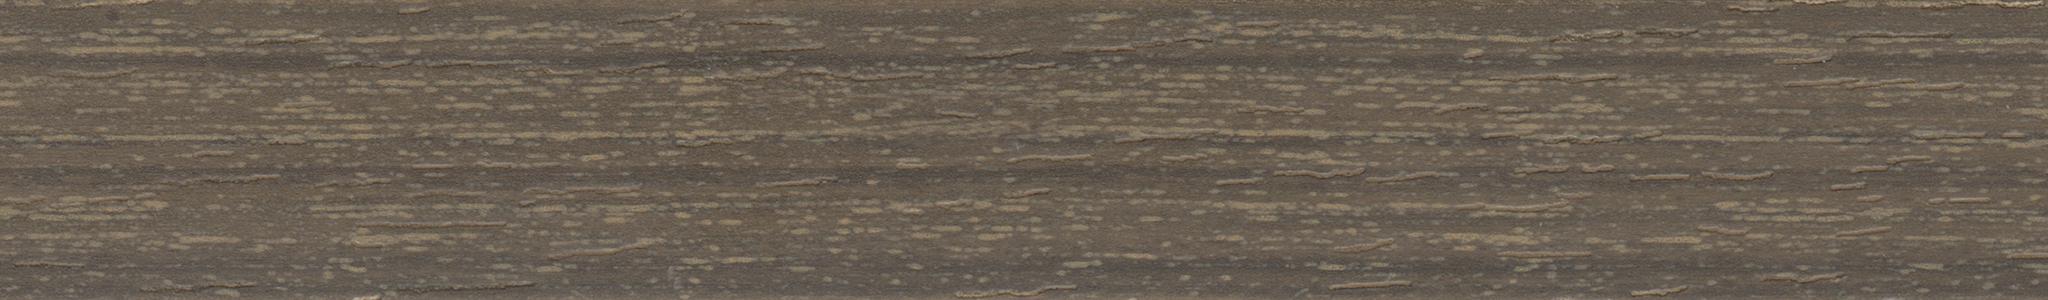 HD 293096 ABS Kante Dekor Ironwood Pore